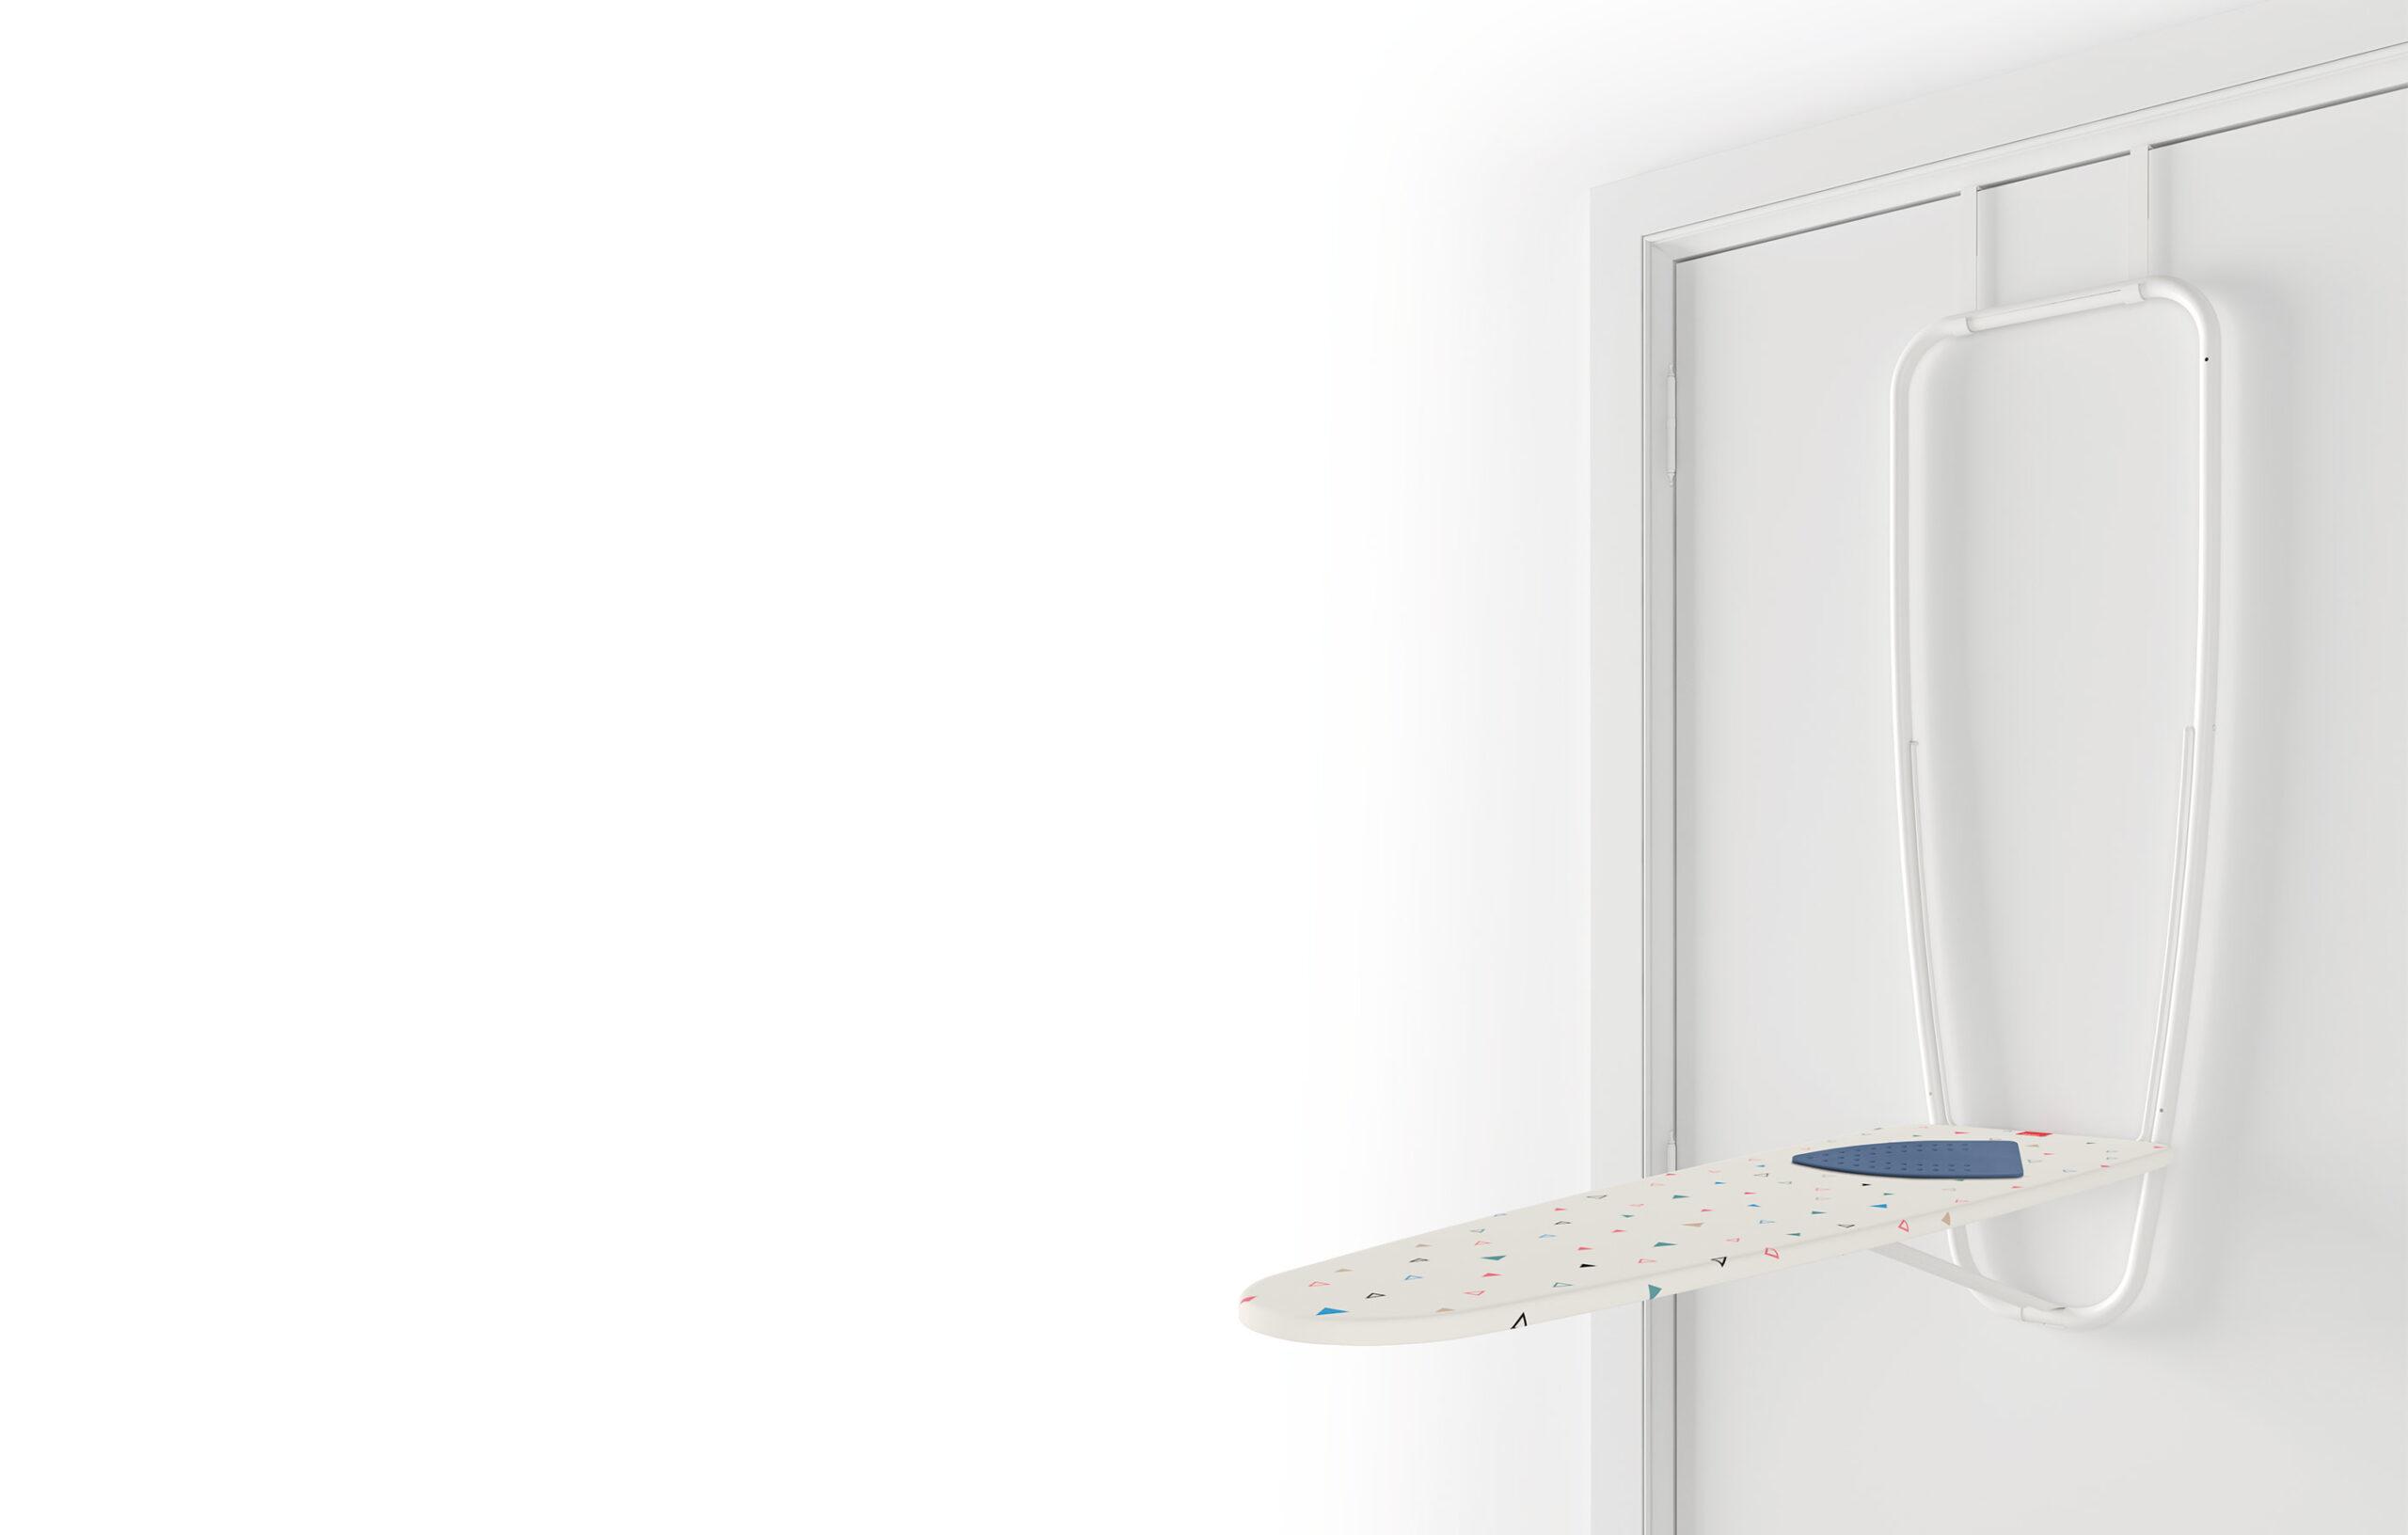 slider-tabla-planchar-3-scaled Rayen | Soluciones innovadoras para el hogar | Tabla de planchar colgante | Rayen.com